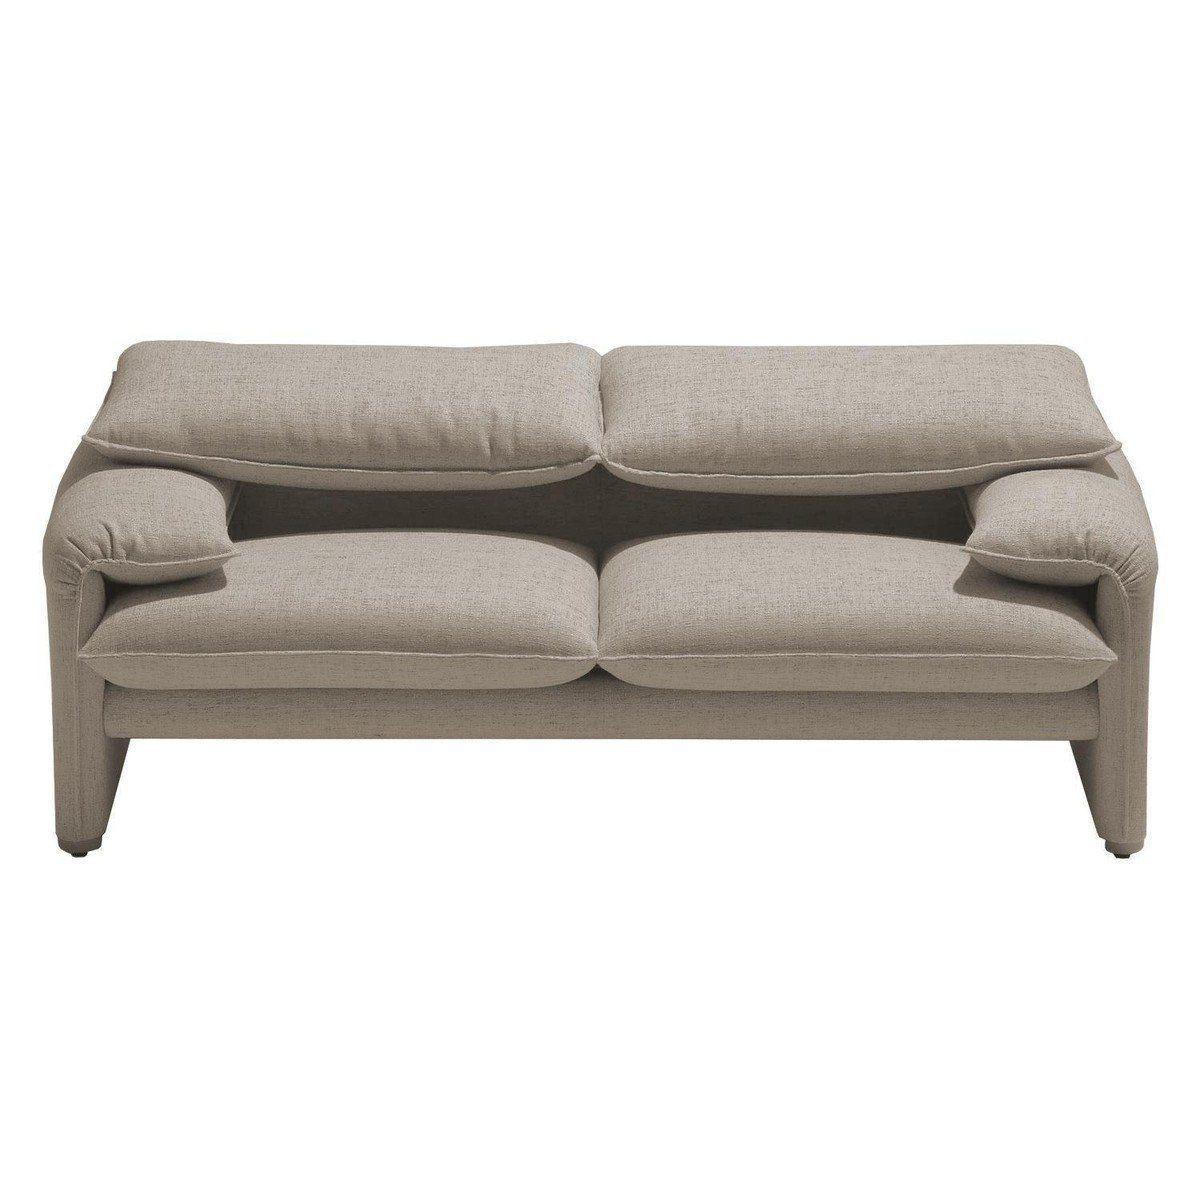 2 sitz sofa mit perfect sofa sitzer sofa n sofa sitzer leder schwarz with 2 sitz sofa mit good. Black Bedroom Furniture Sets. Home Design Ideas